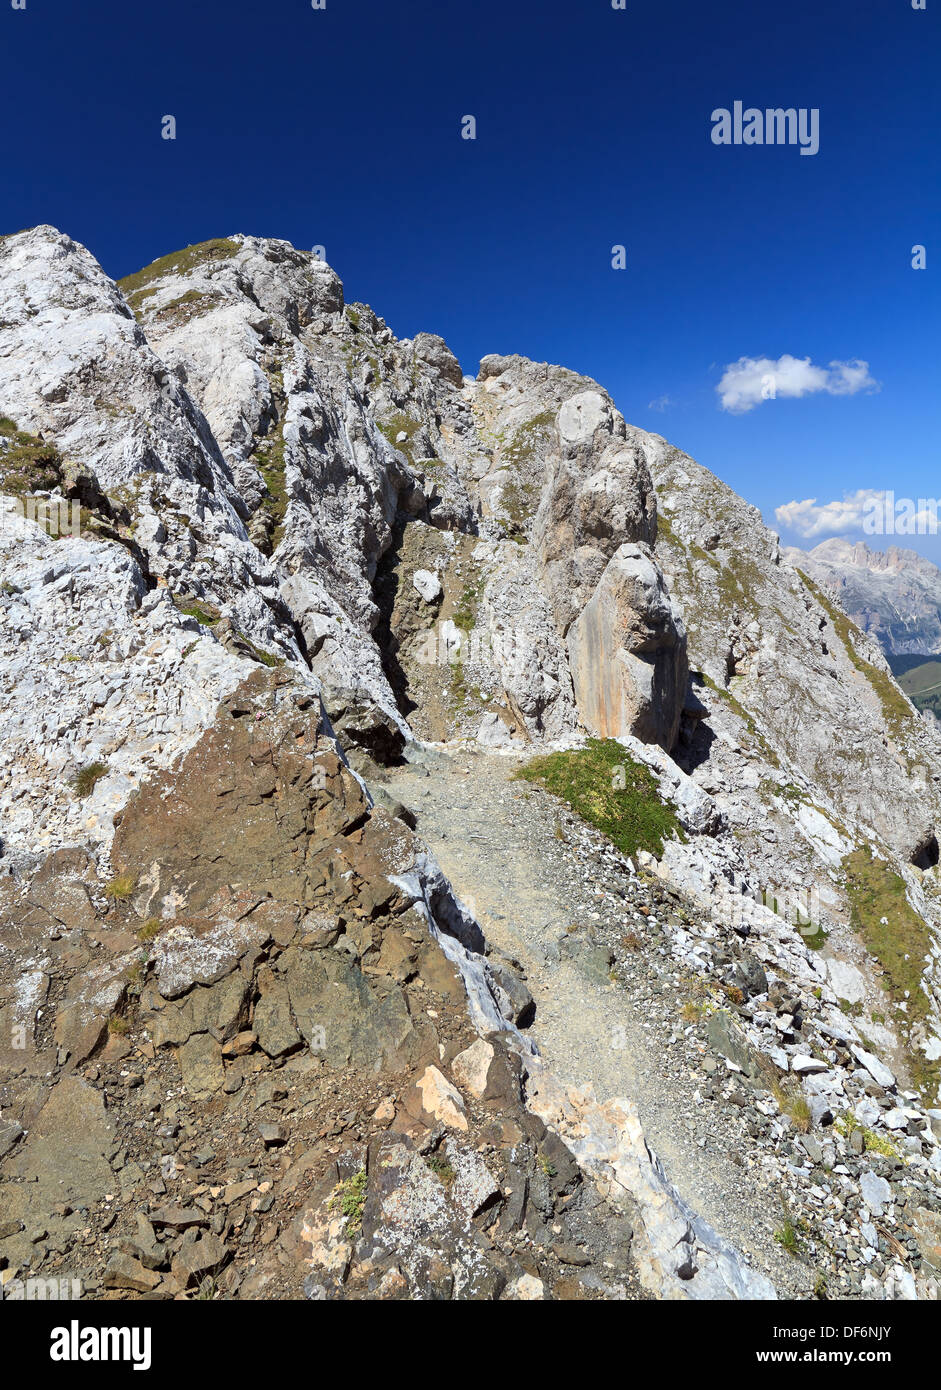 path in mountain ridge in San Pellegrino valley, Trentino, Italy Stock Photo